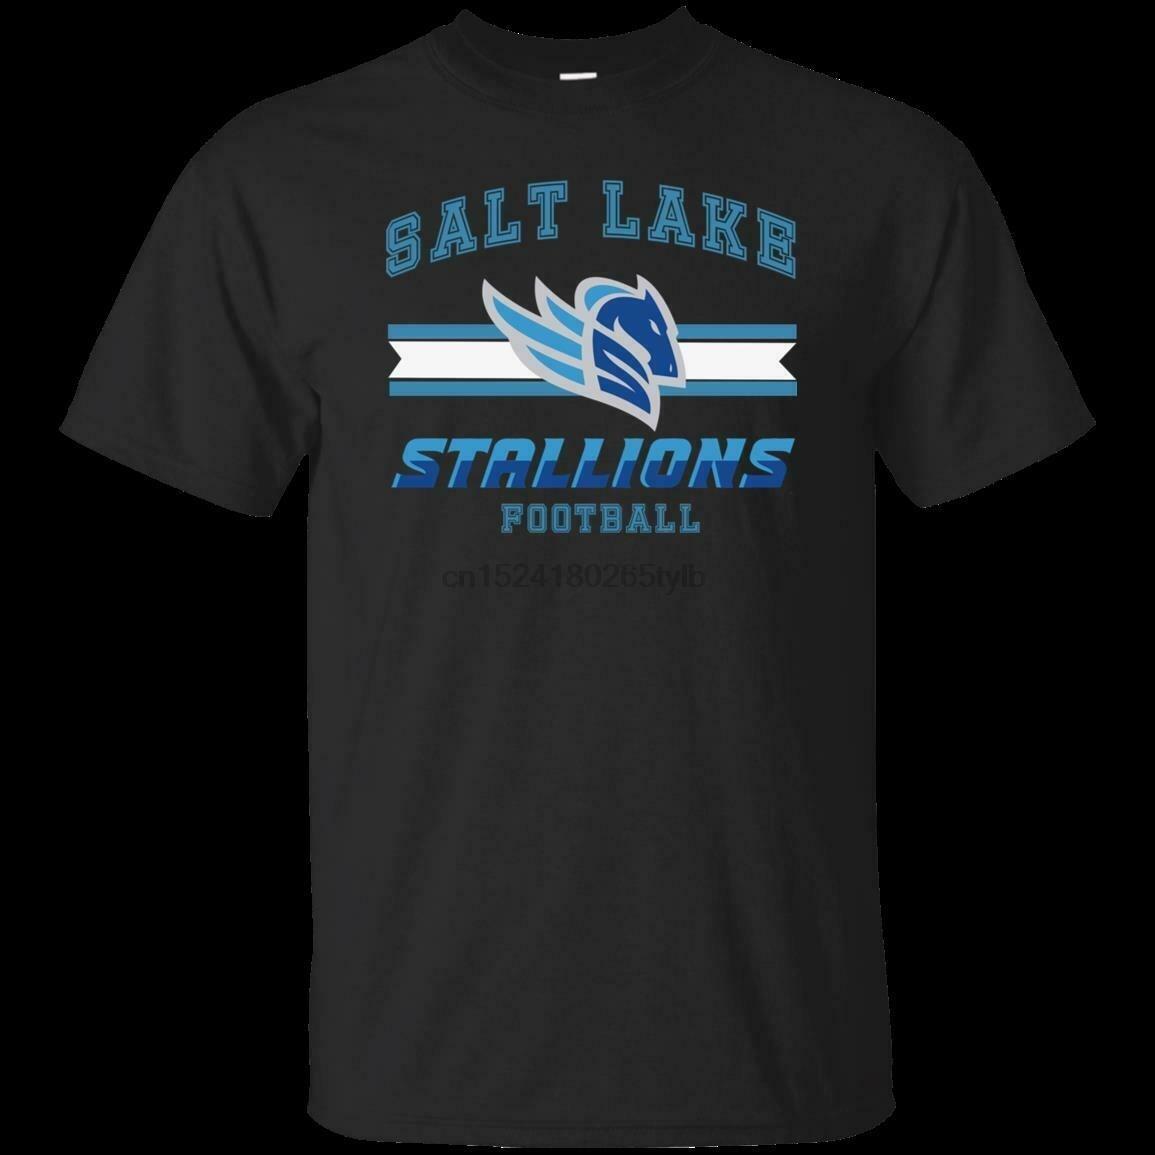 NEW Salt Lake Stallions T-Shirt Alliance America Football Black Navy Cotton Tee